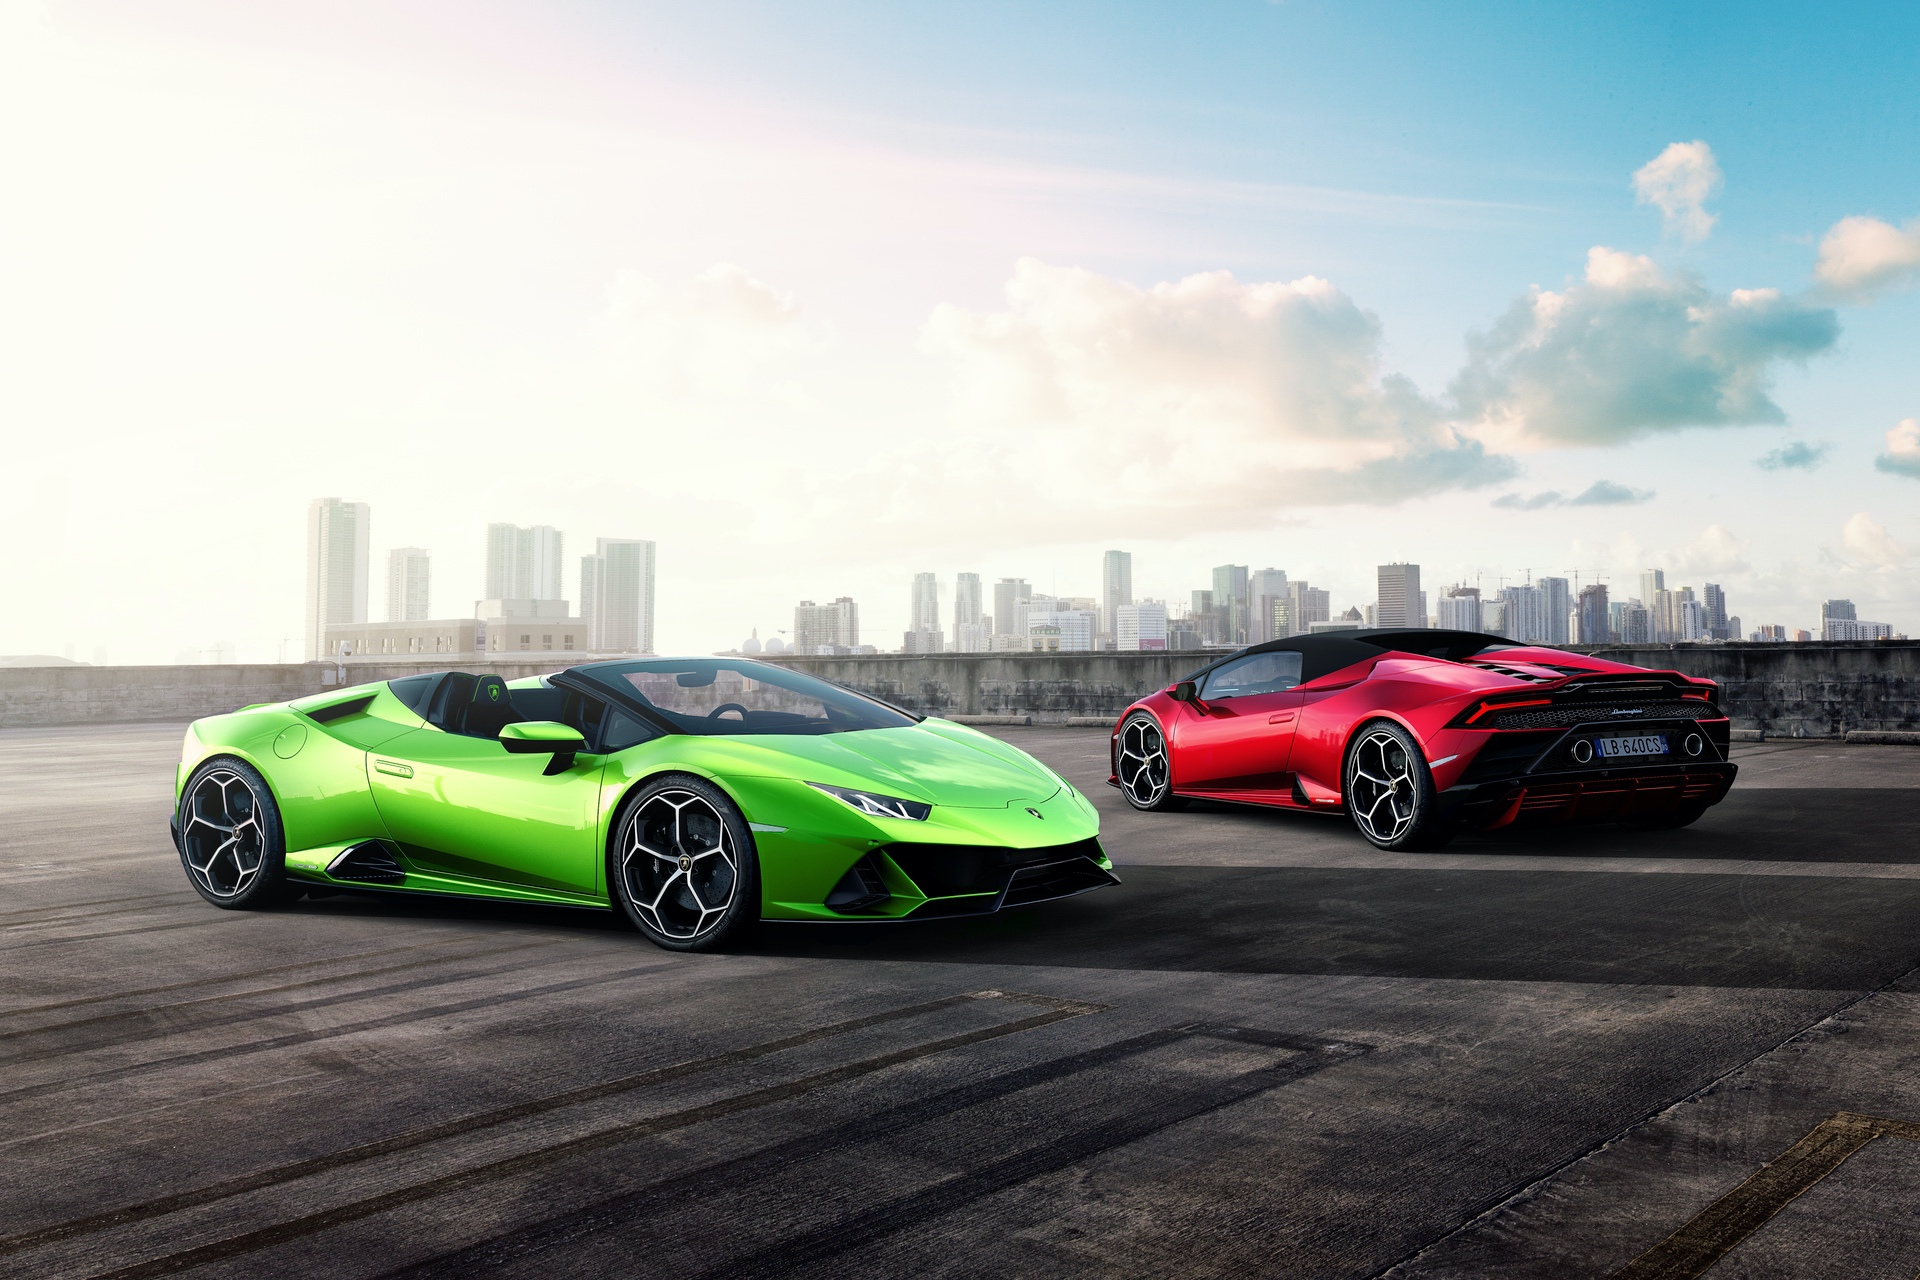 Lamborghini_Huracan_Evo_Spyder_0008